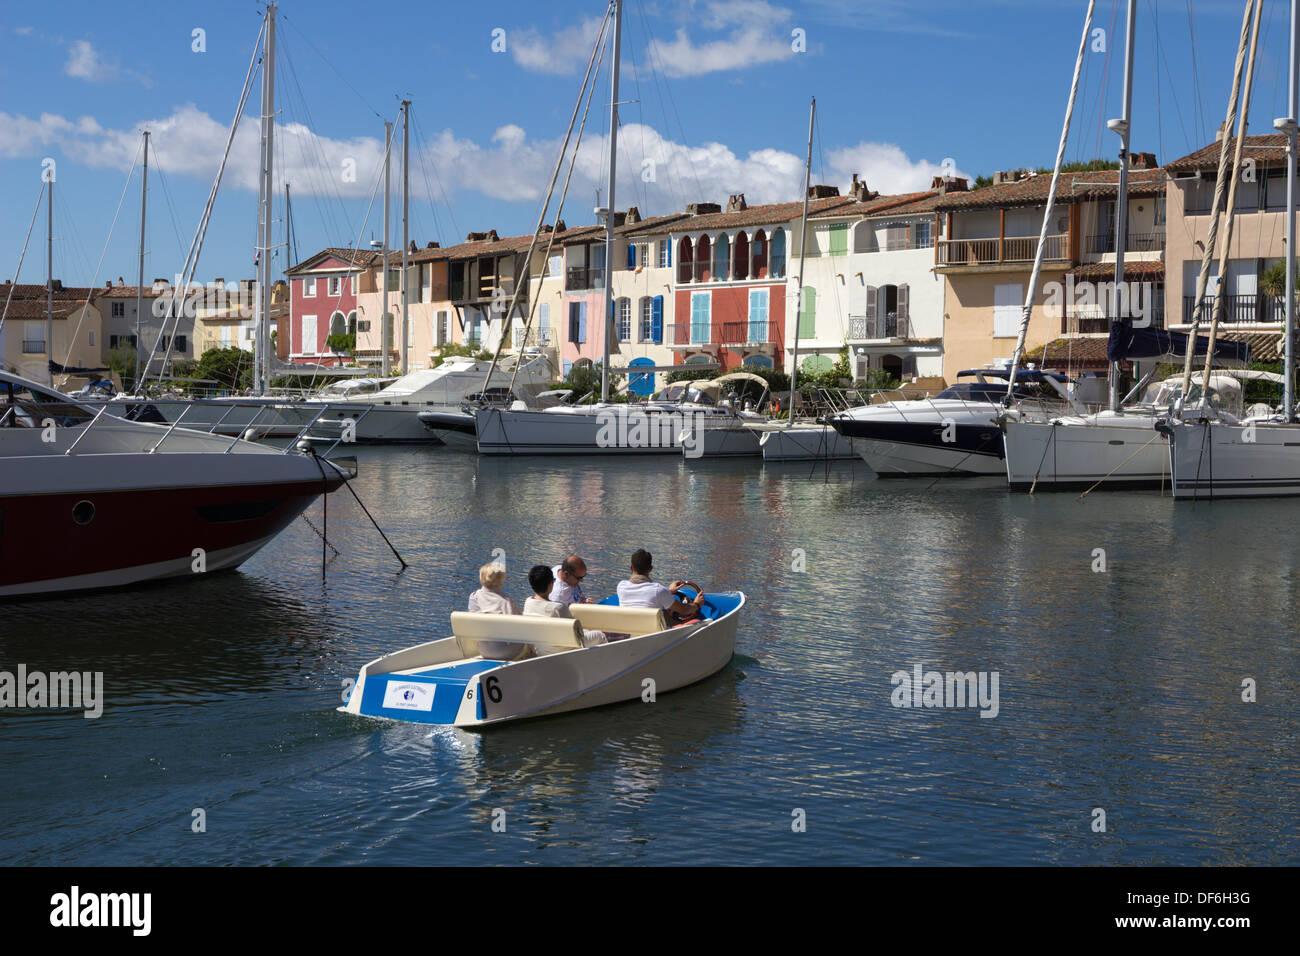 Port Grimaud, Var, Provence-Alpes-Cote d'Azur, France, Europe Stock Photo